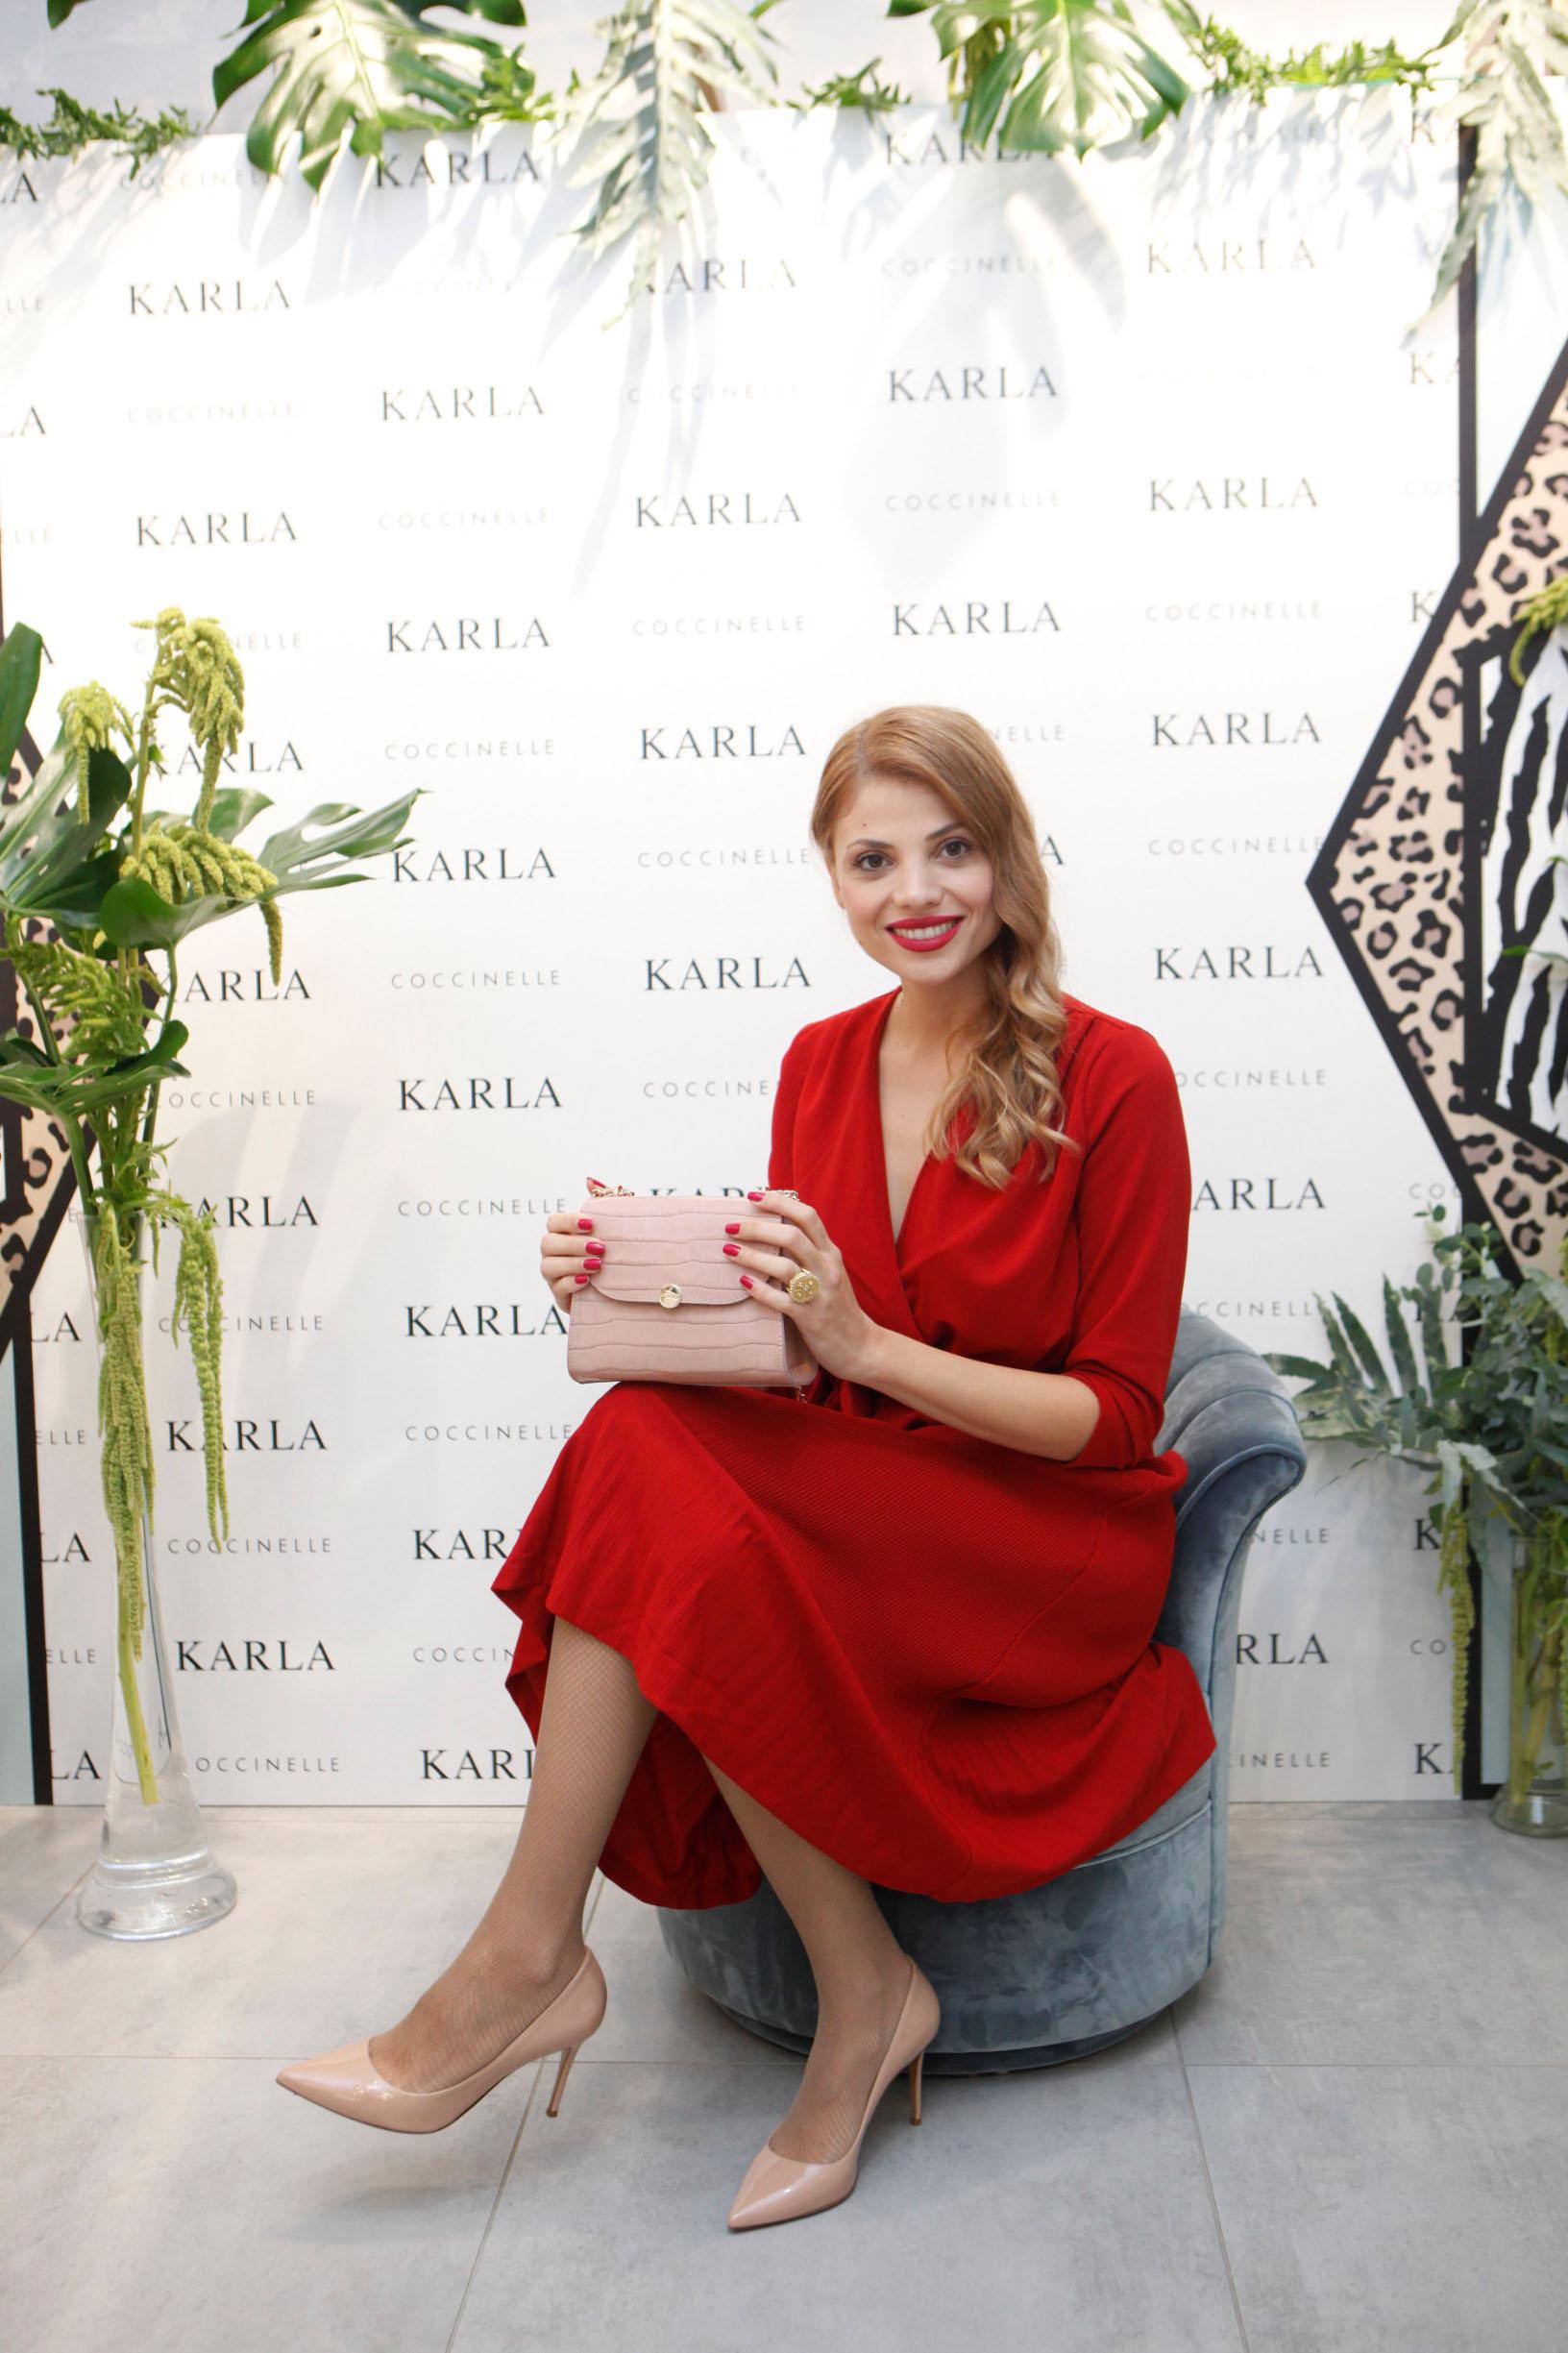 otvorenje preuredjenog butika za cipele Karla te promocija Gloria Glam casopisa / Karla / Zagreb 19.10.2019. / foto: Maja jurovic / Lejla Filipovic